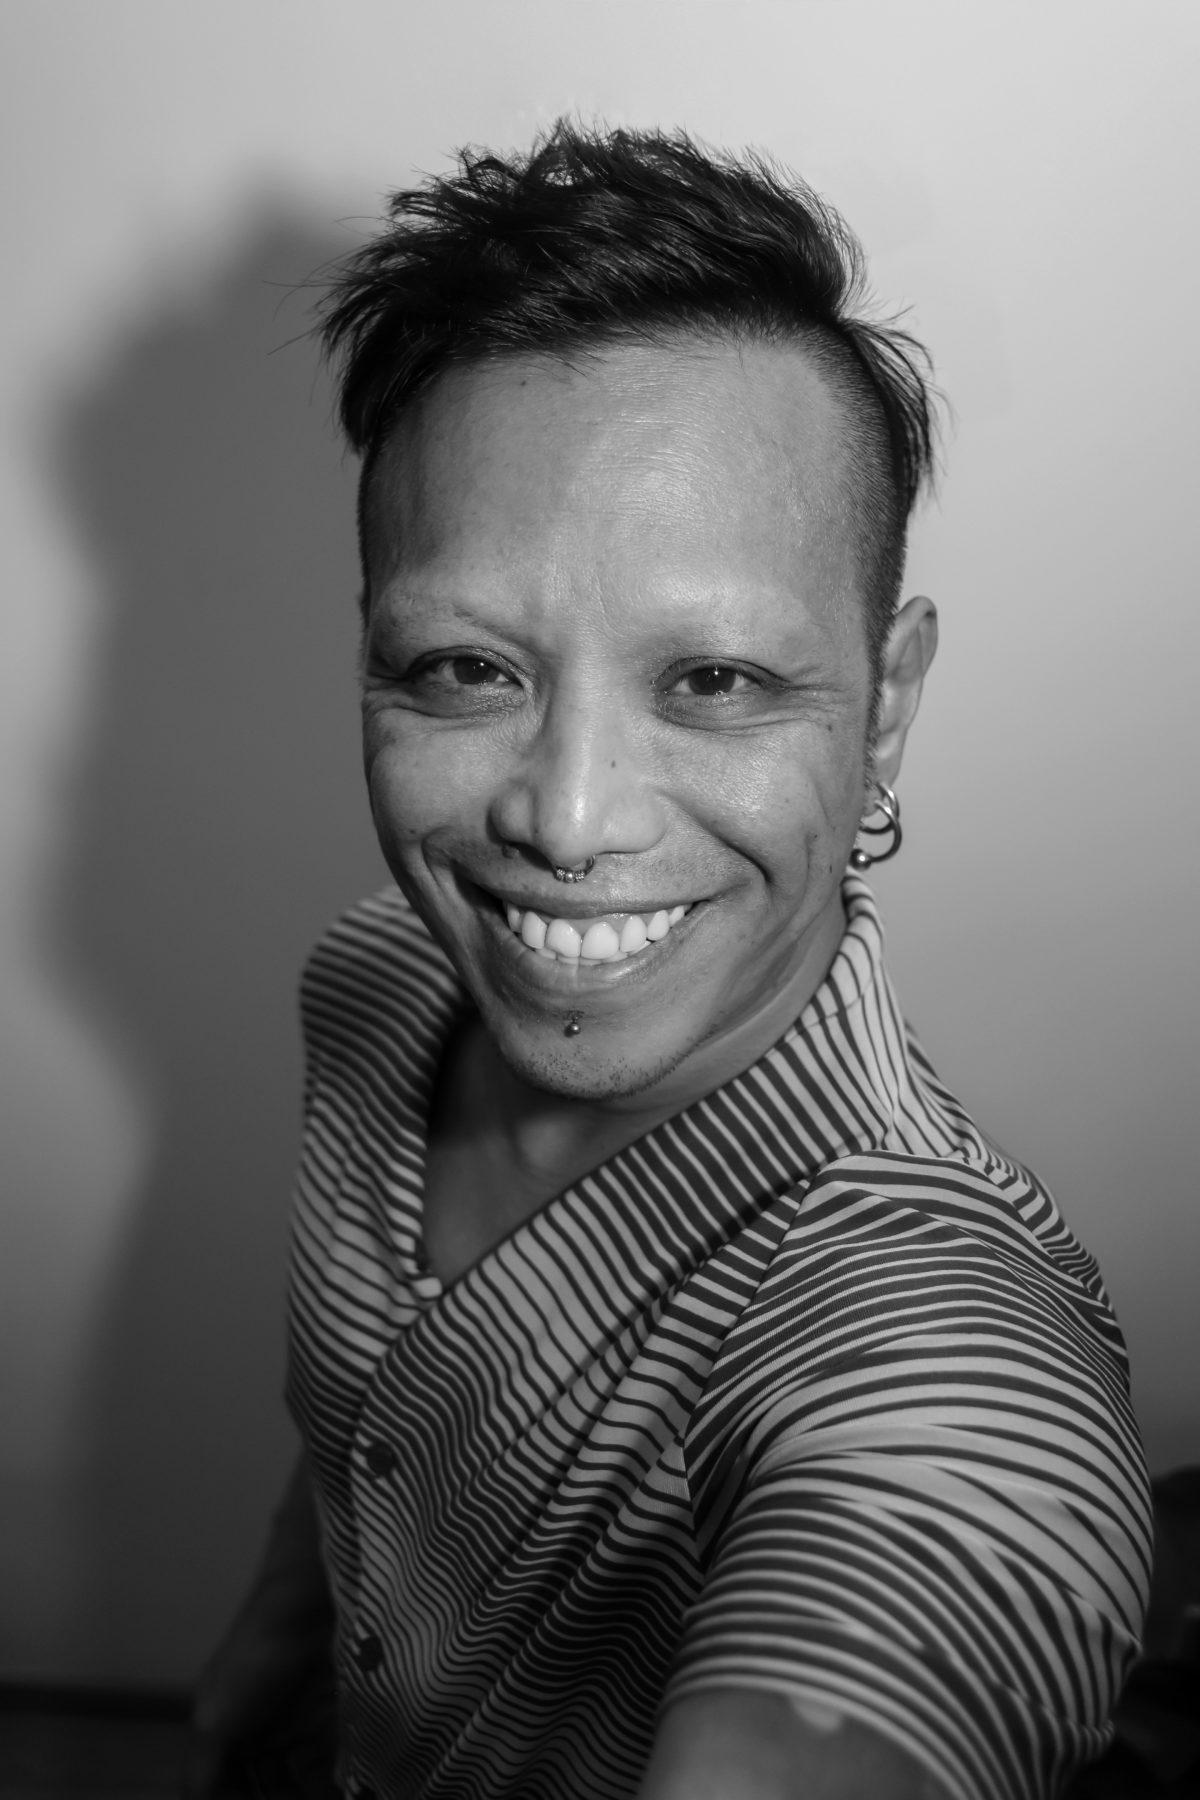 Ernest Mandap